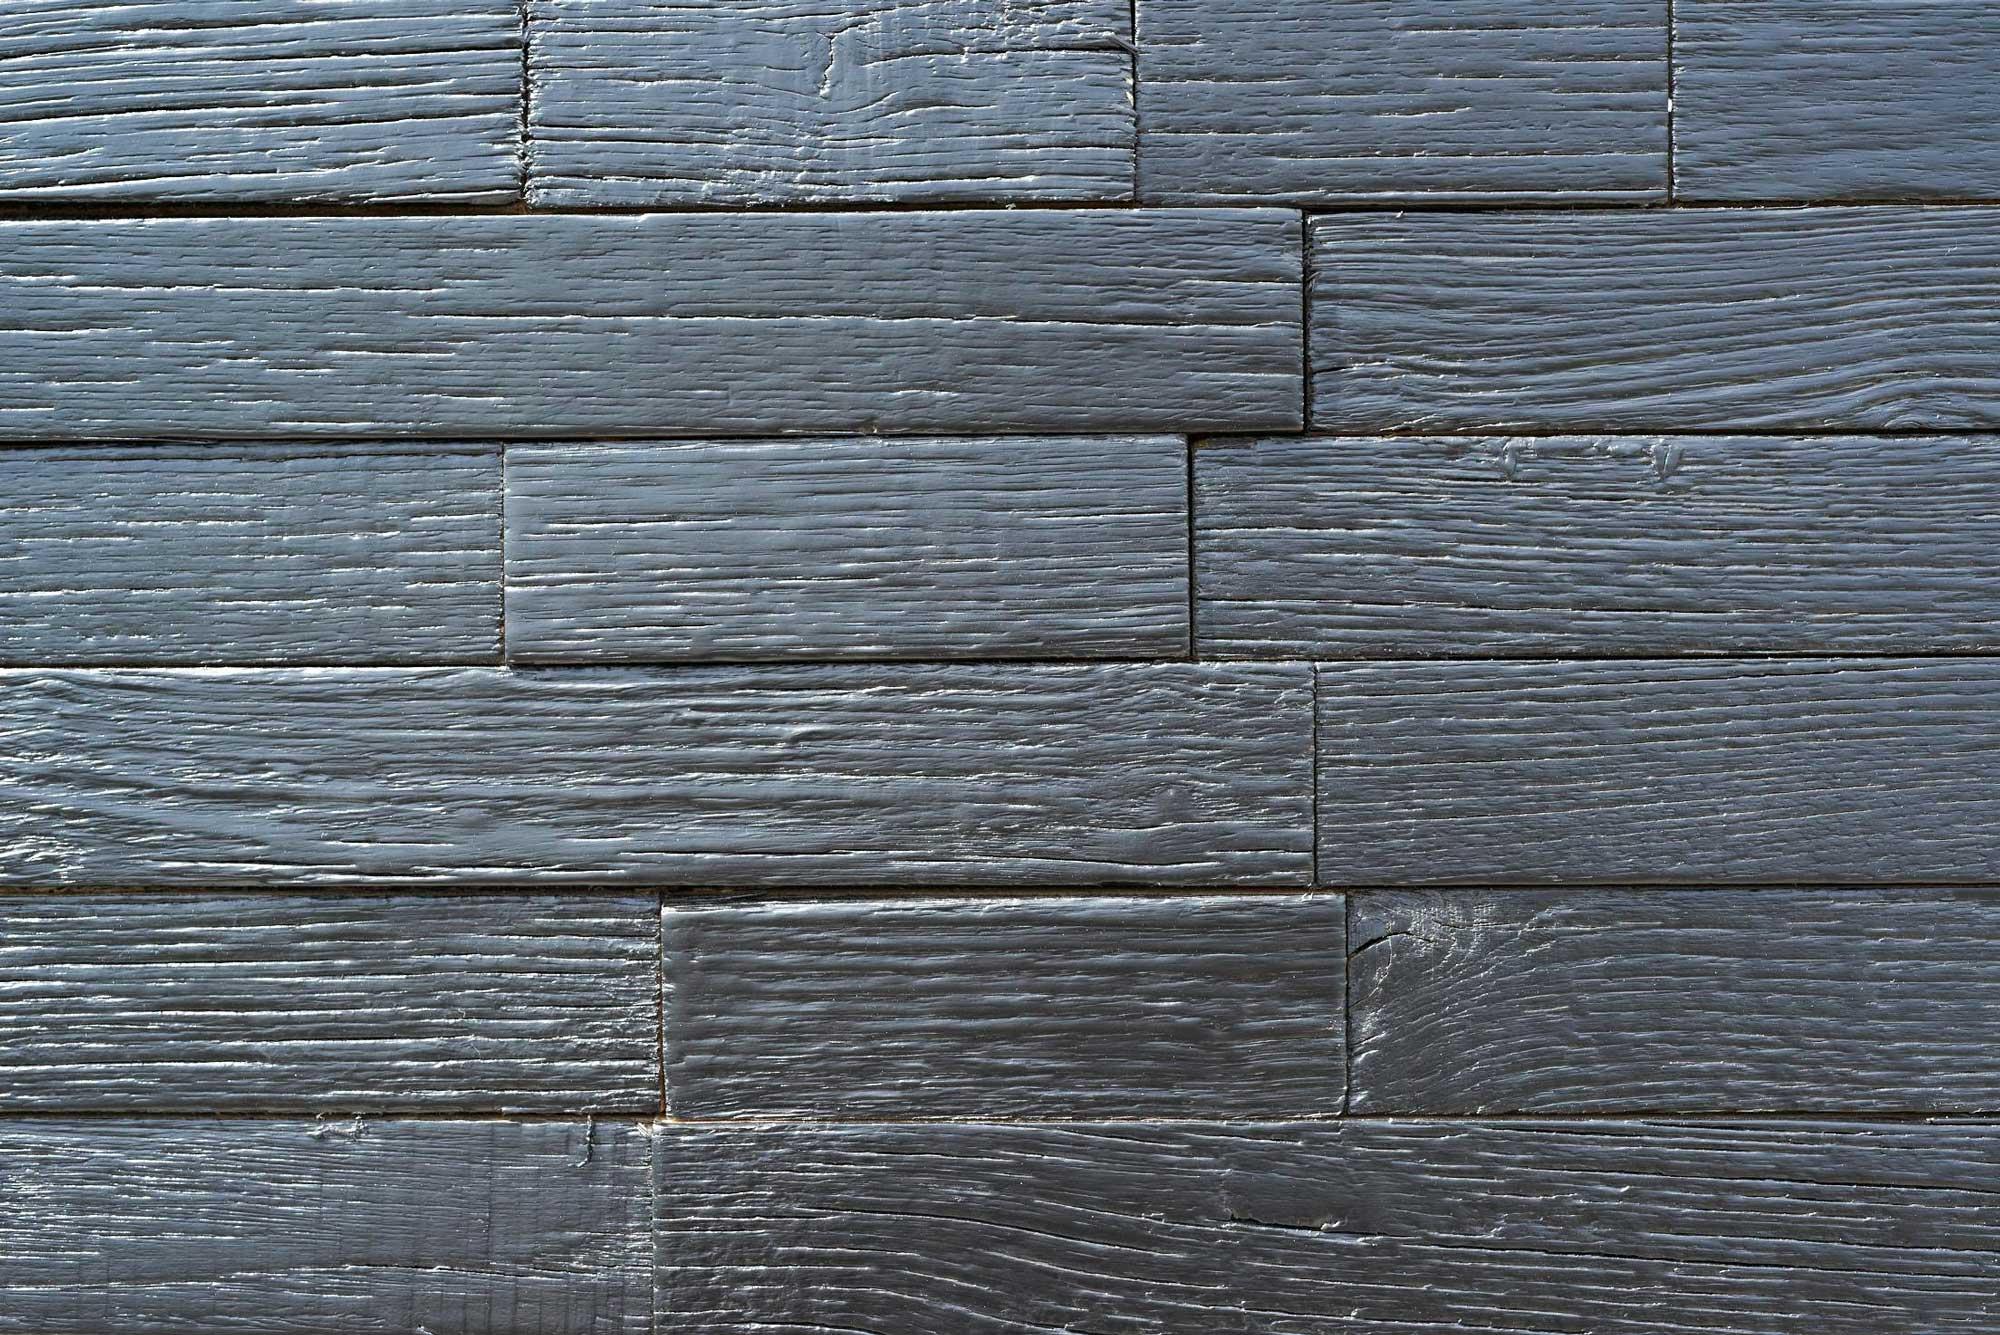 wandpaneele-holz-kastanie-lackiert-recycelt-solid-coal